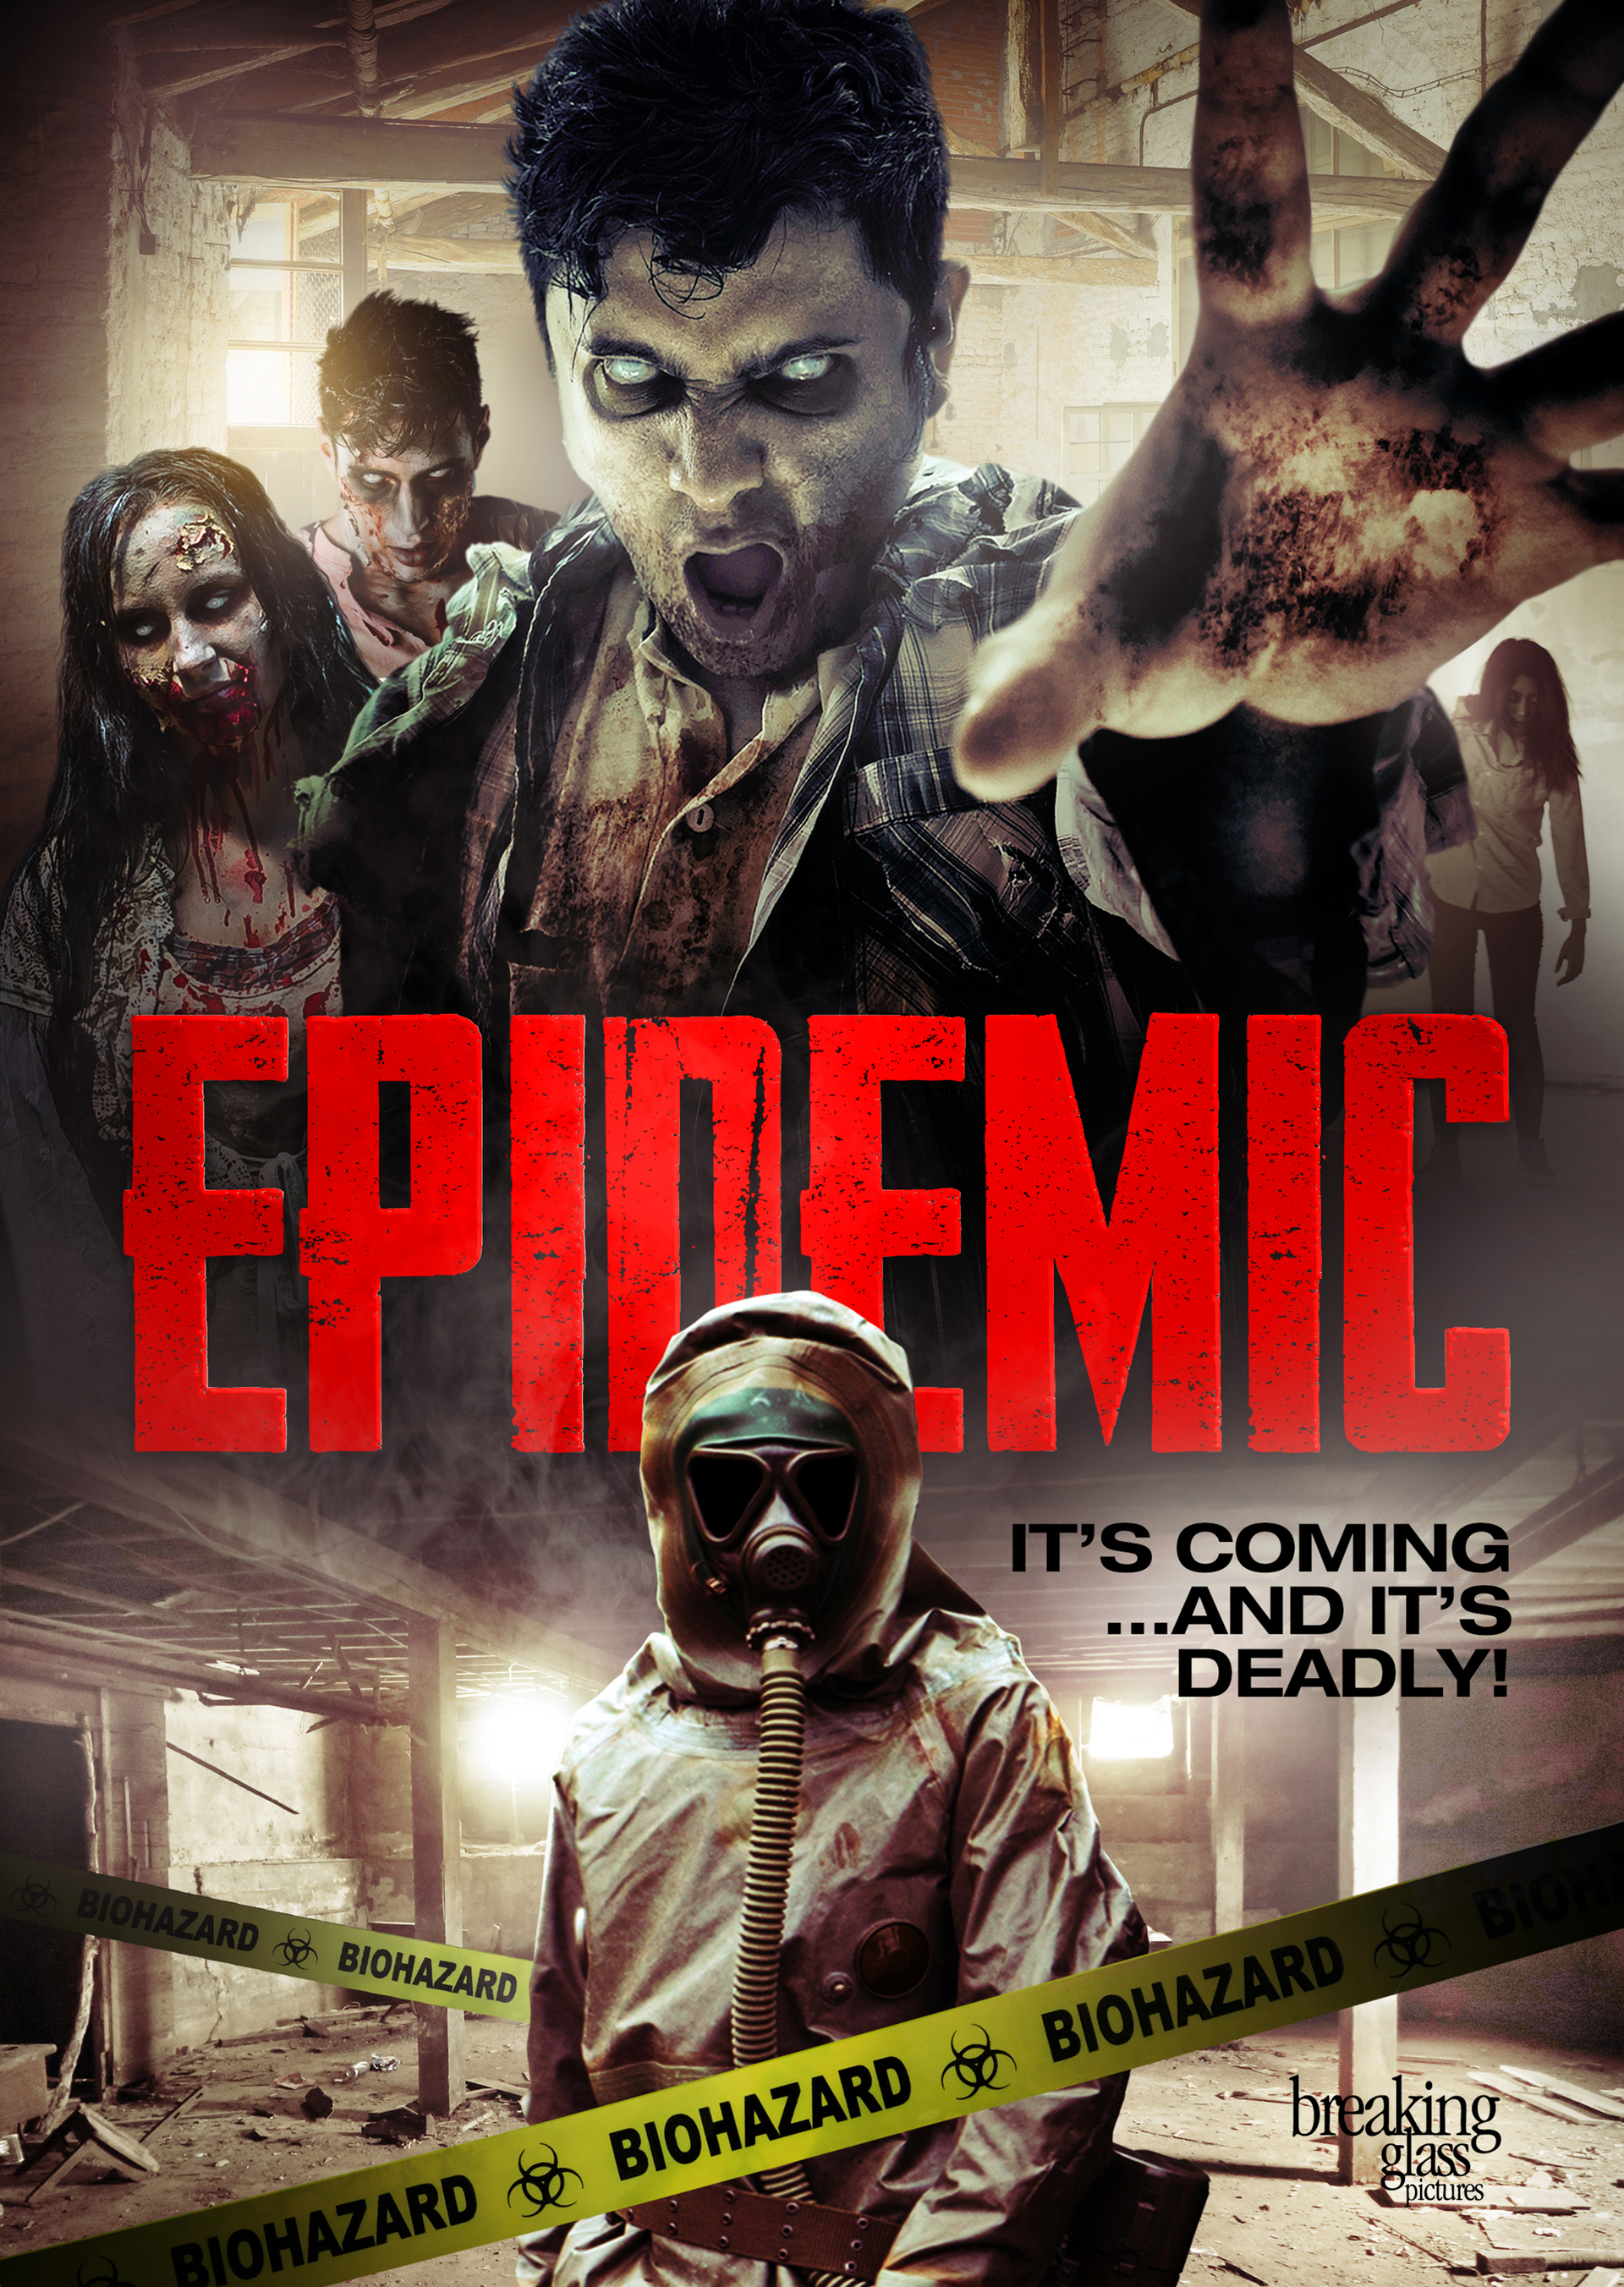 Epidemic_KA_Final_Logo.jpg?1533495221